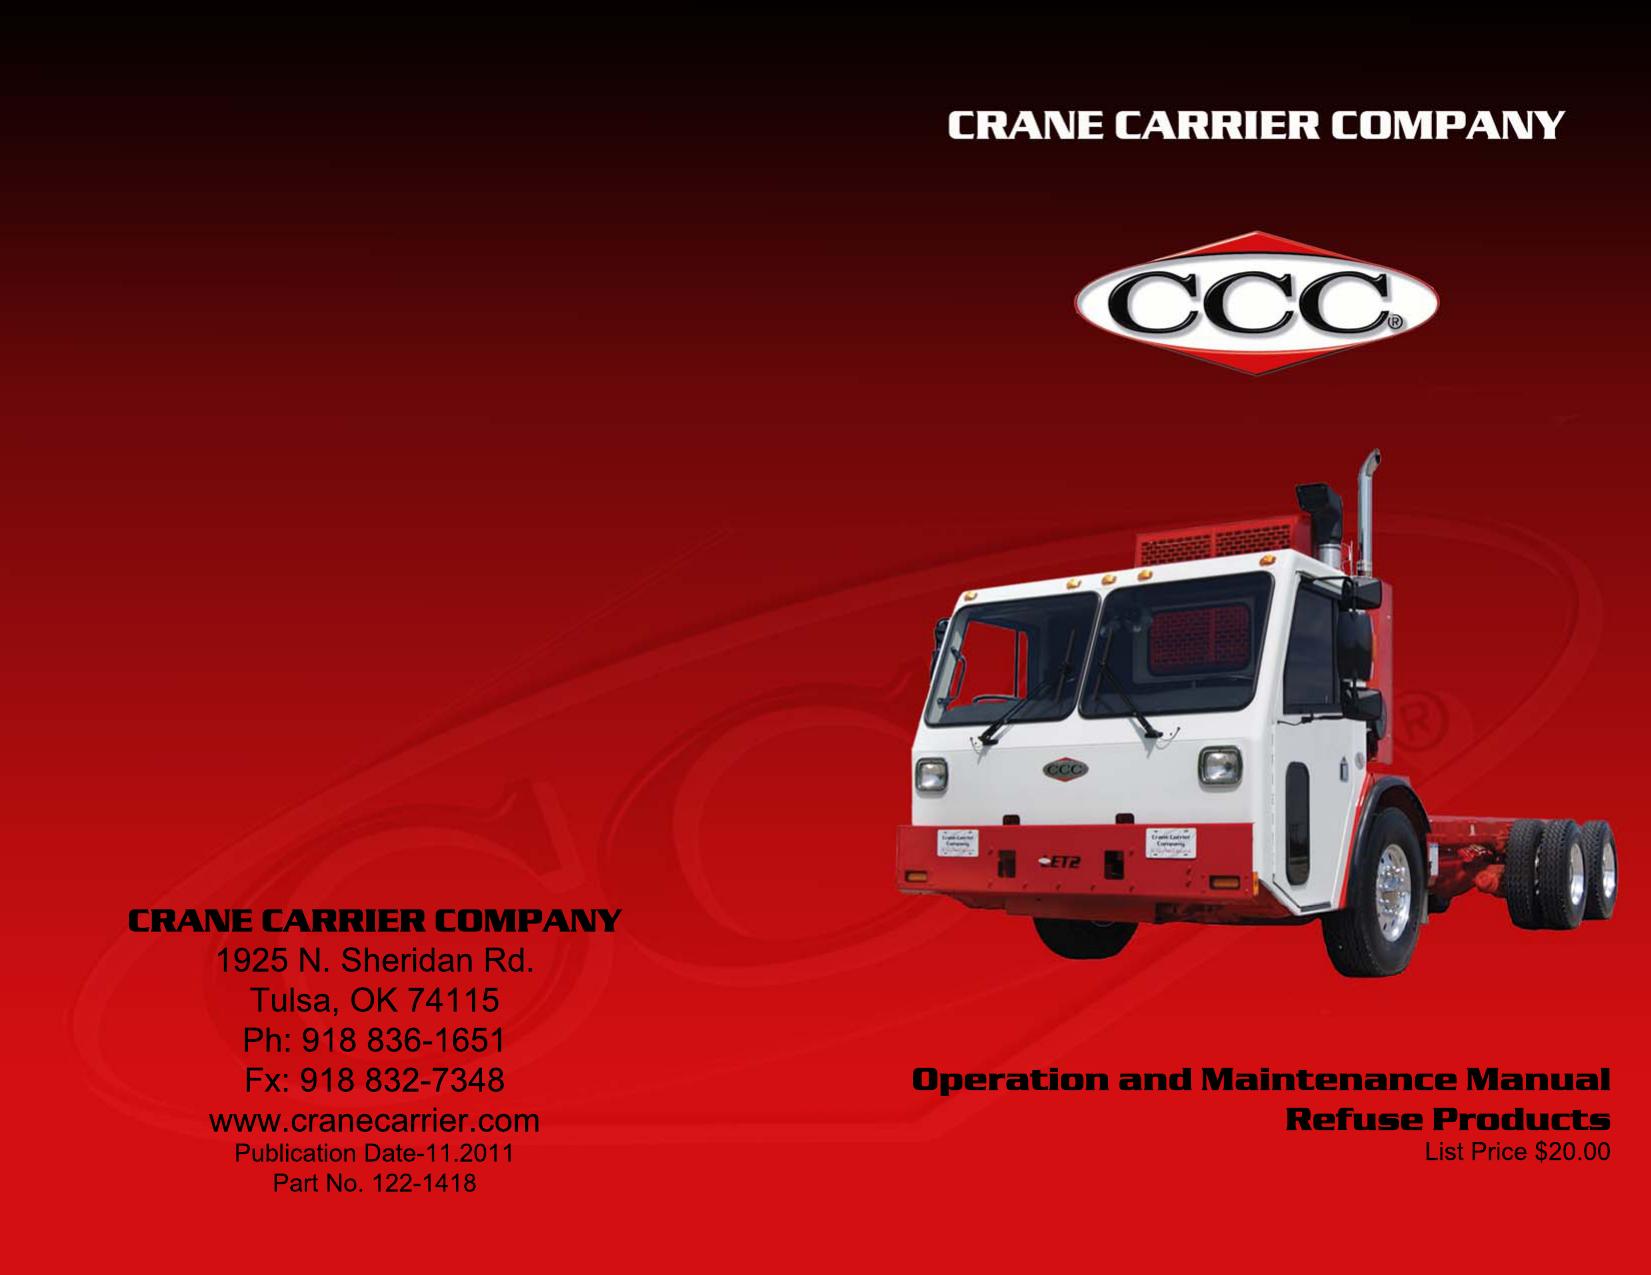 Lt2 Op Manual 2011 - Crane Carrier Company | manualzz com